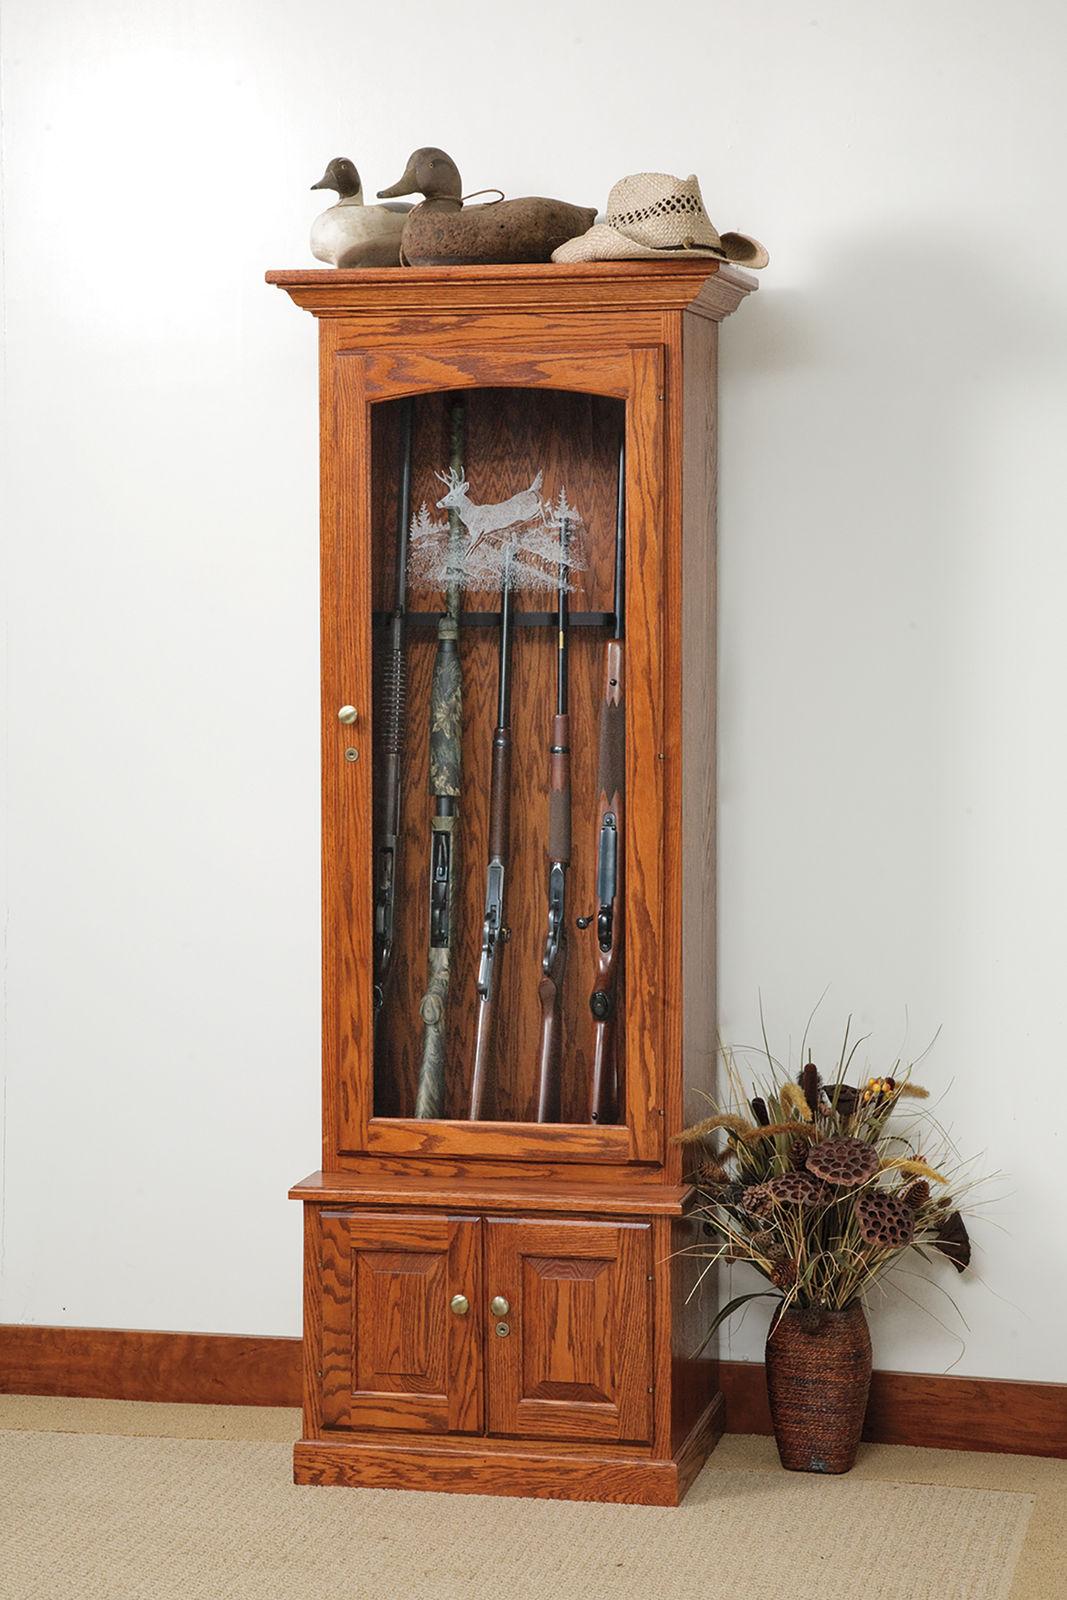 Photo of: JSW 6 Gun Cabinet